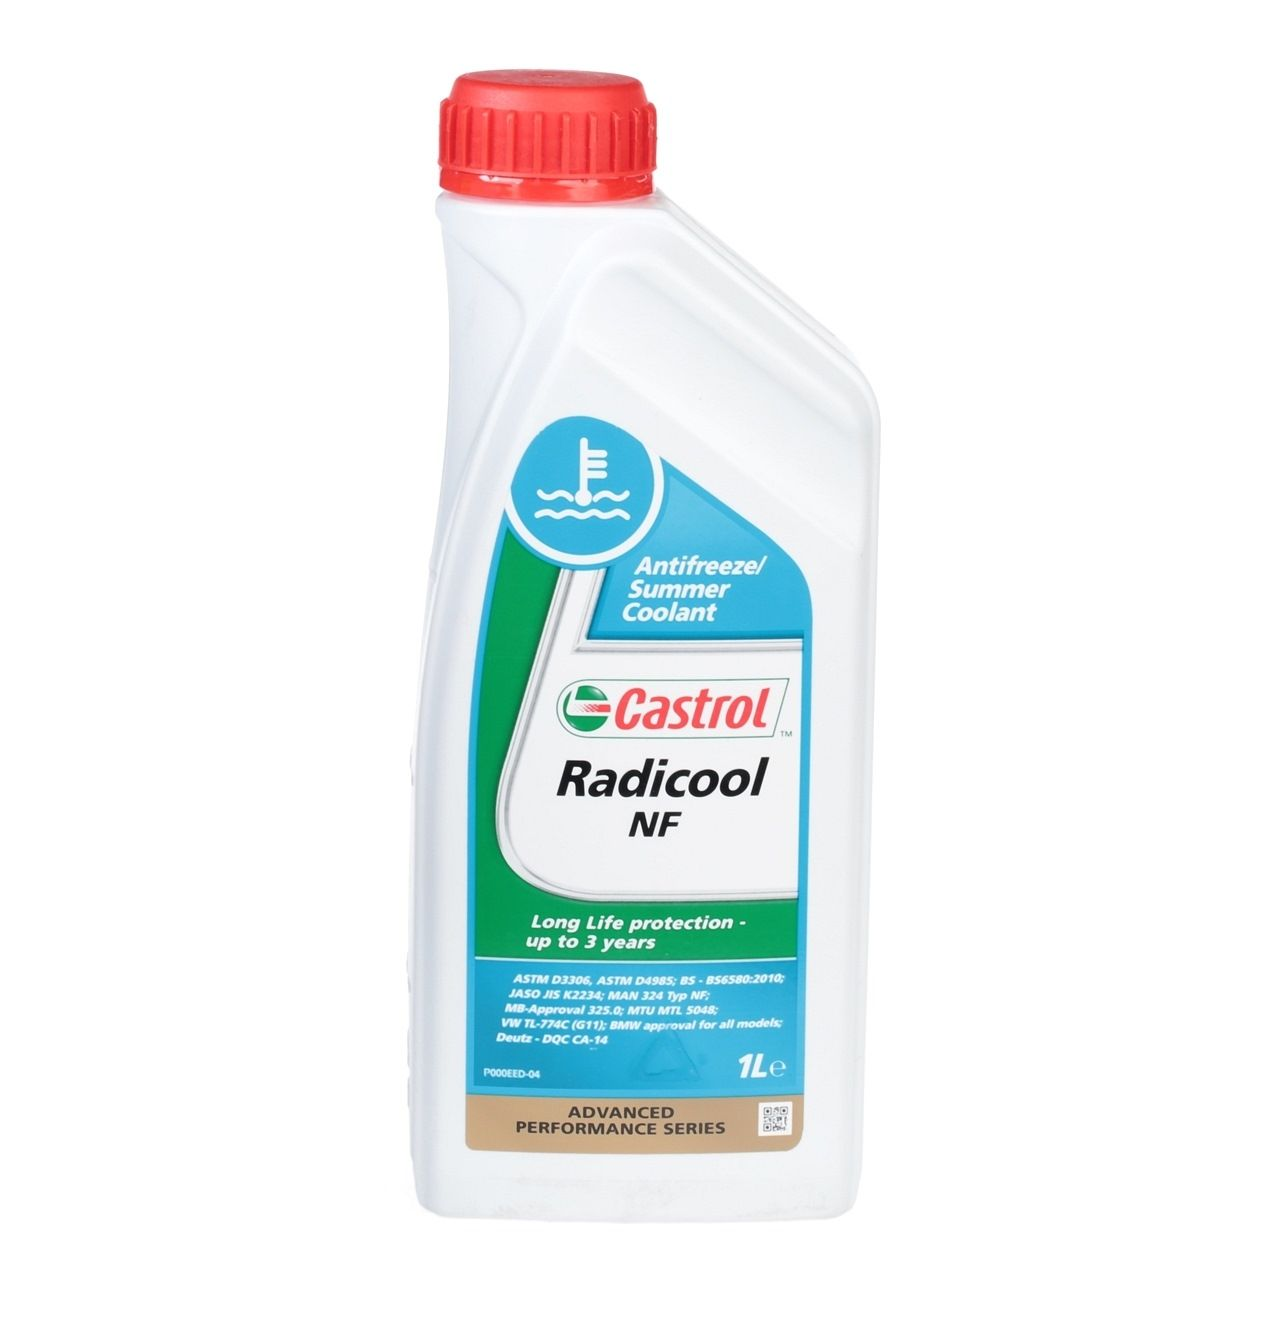 Glycol antifreeze CASTROL DeutzDQCCA14 rating